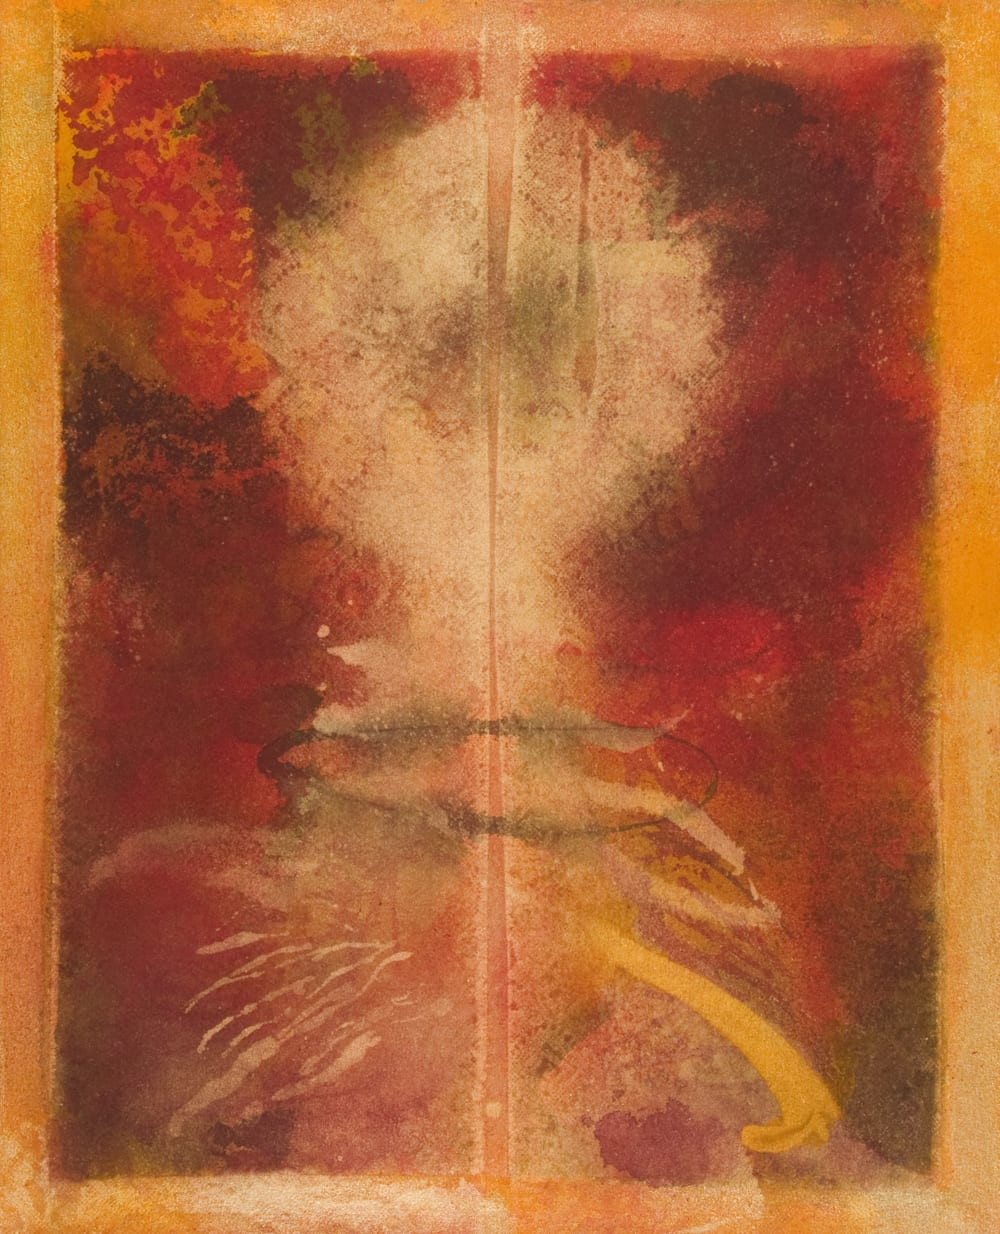 Ari Lankin, Memory, 2015